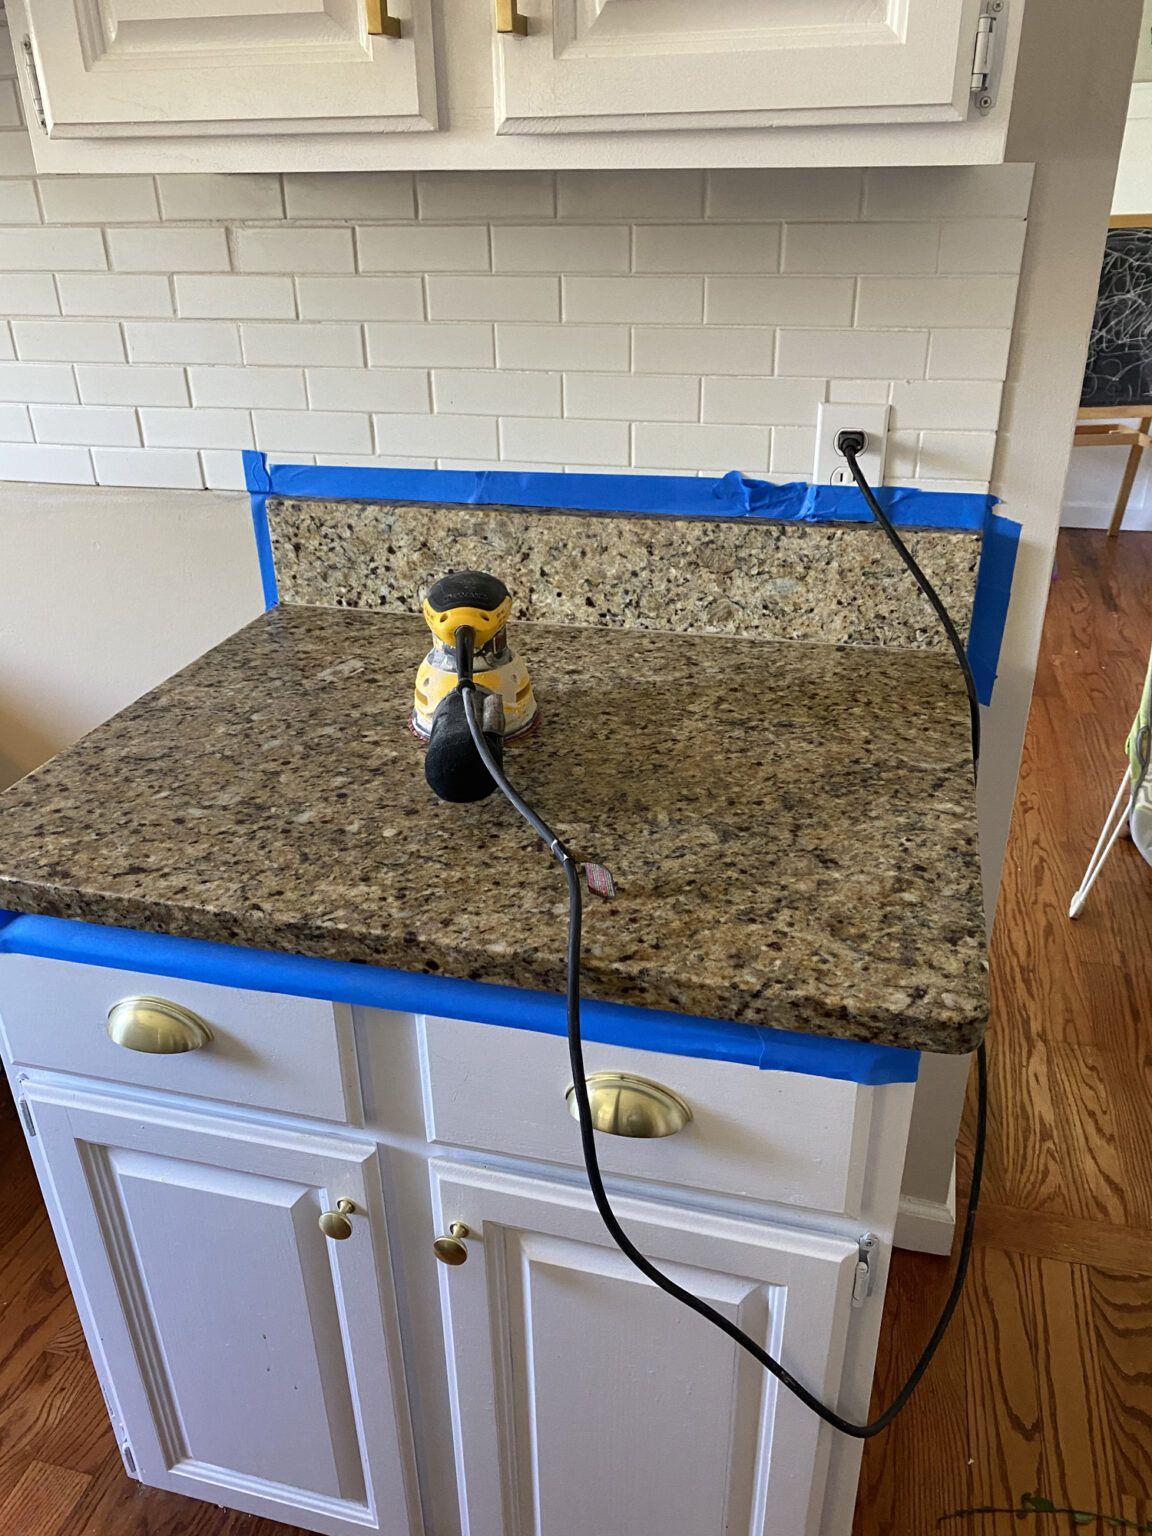 Appliance Epoxy Kitchen Counter Makeover Full Hearted Home In 2020 Countertop Makeover Kitchen Counter Leather Granite